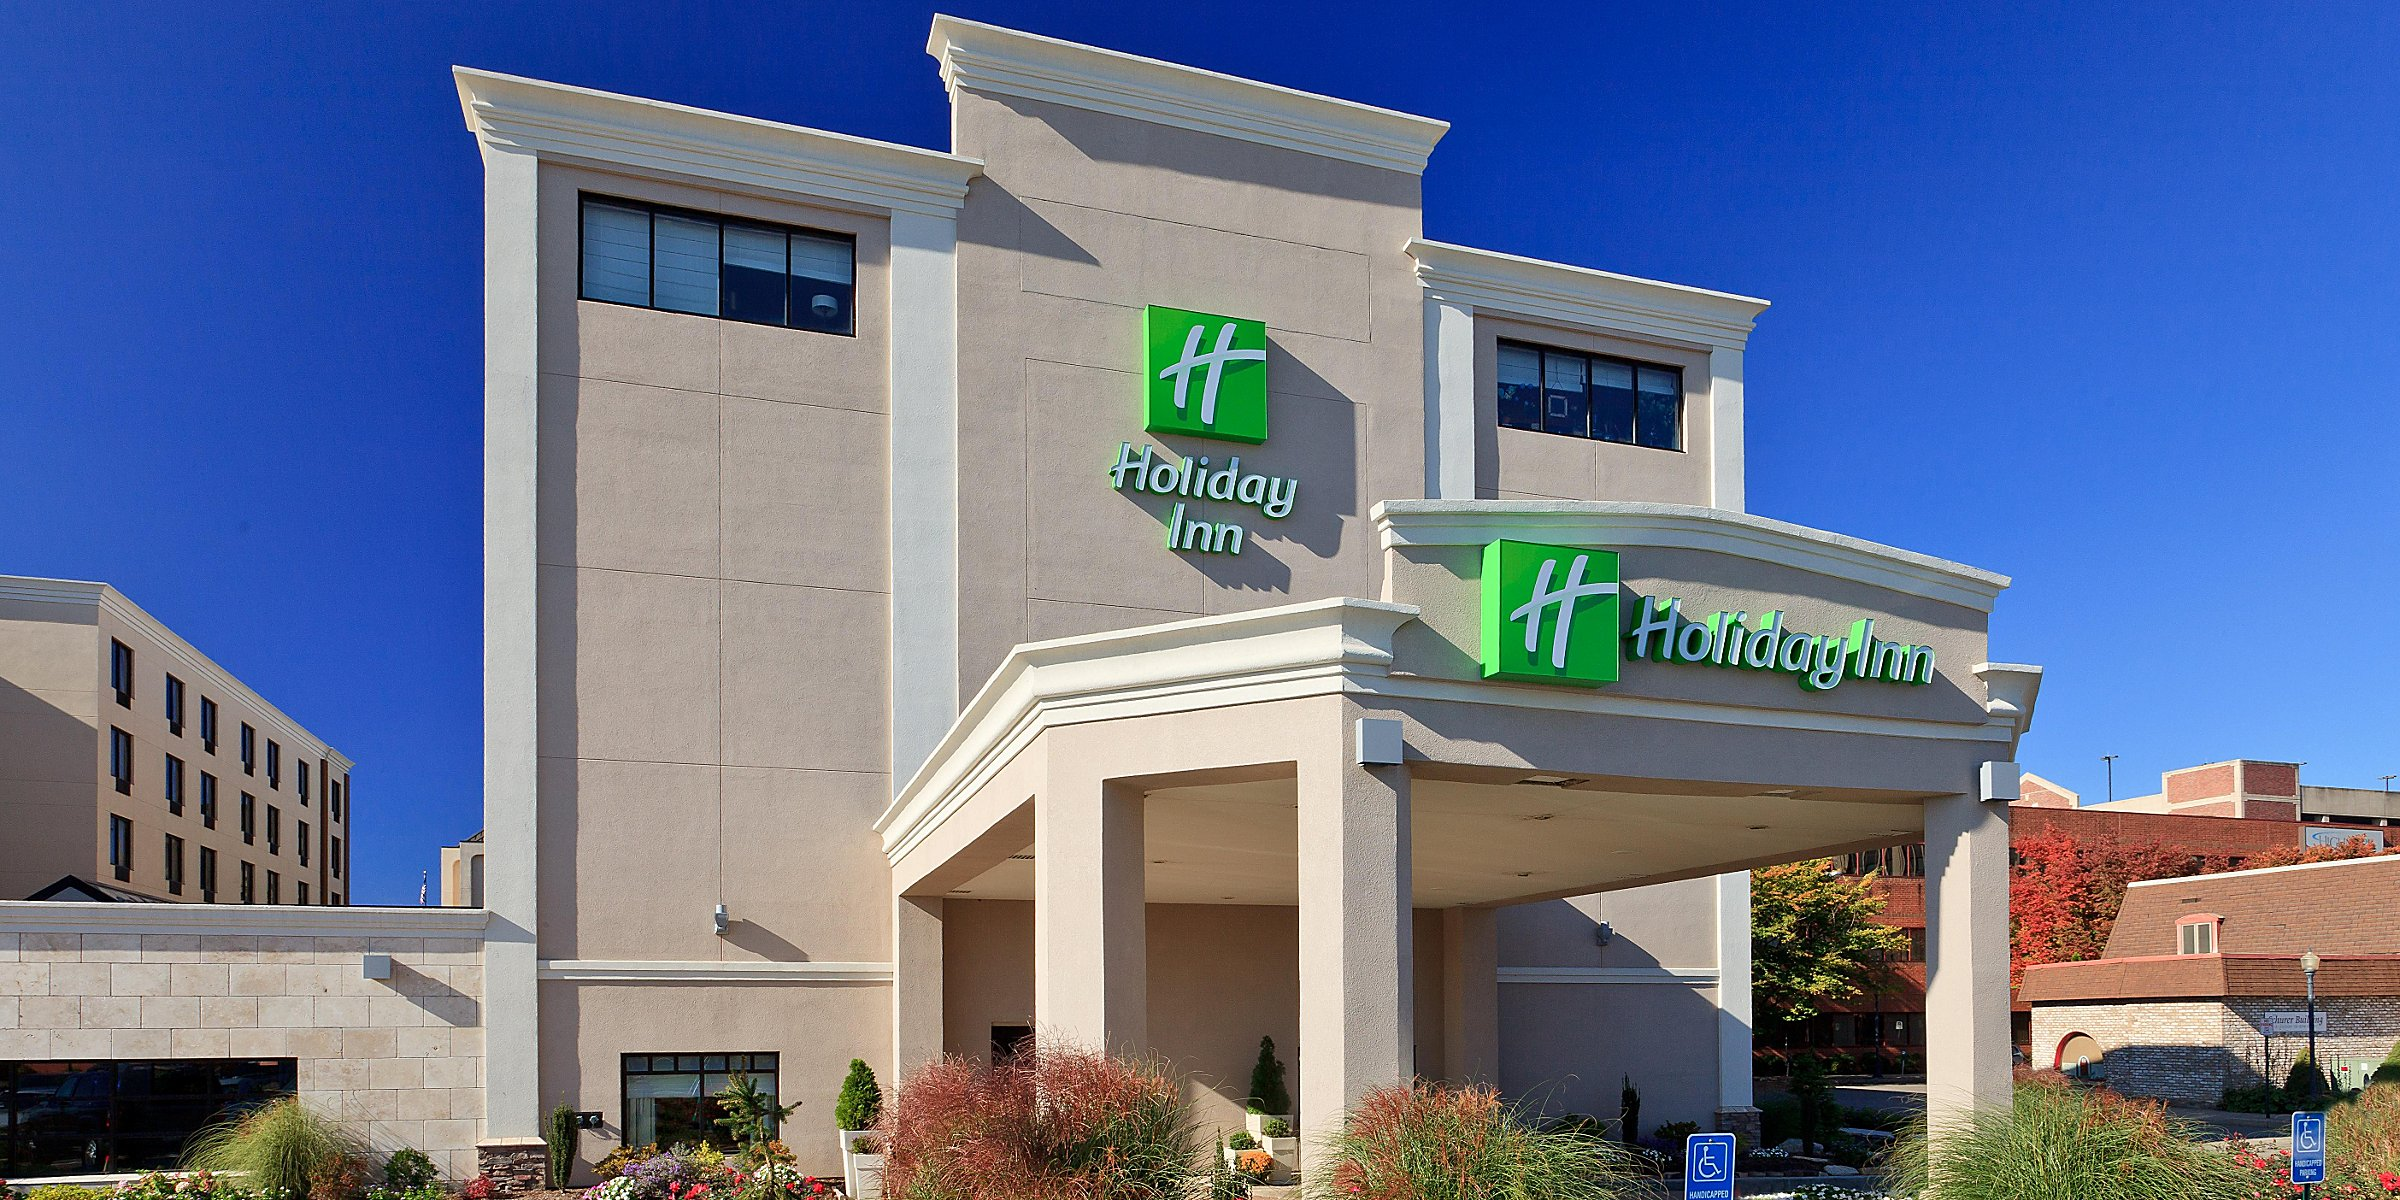 Williamsport Pa Hotel Holiday Inn Williamsport Pennsylvania